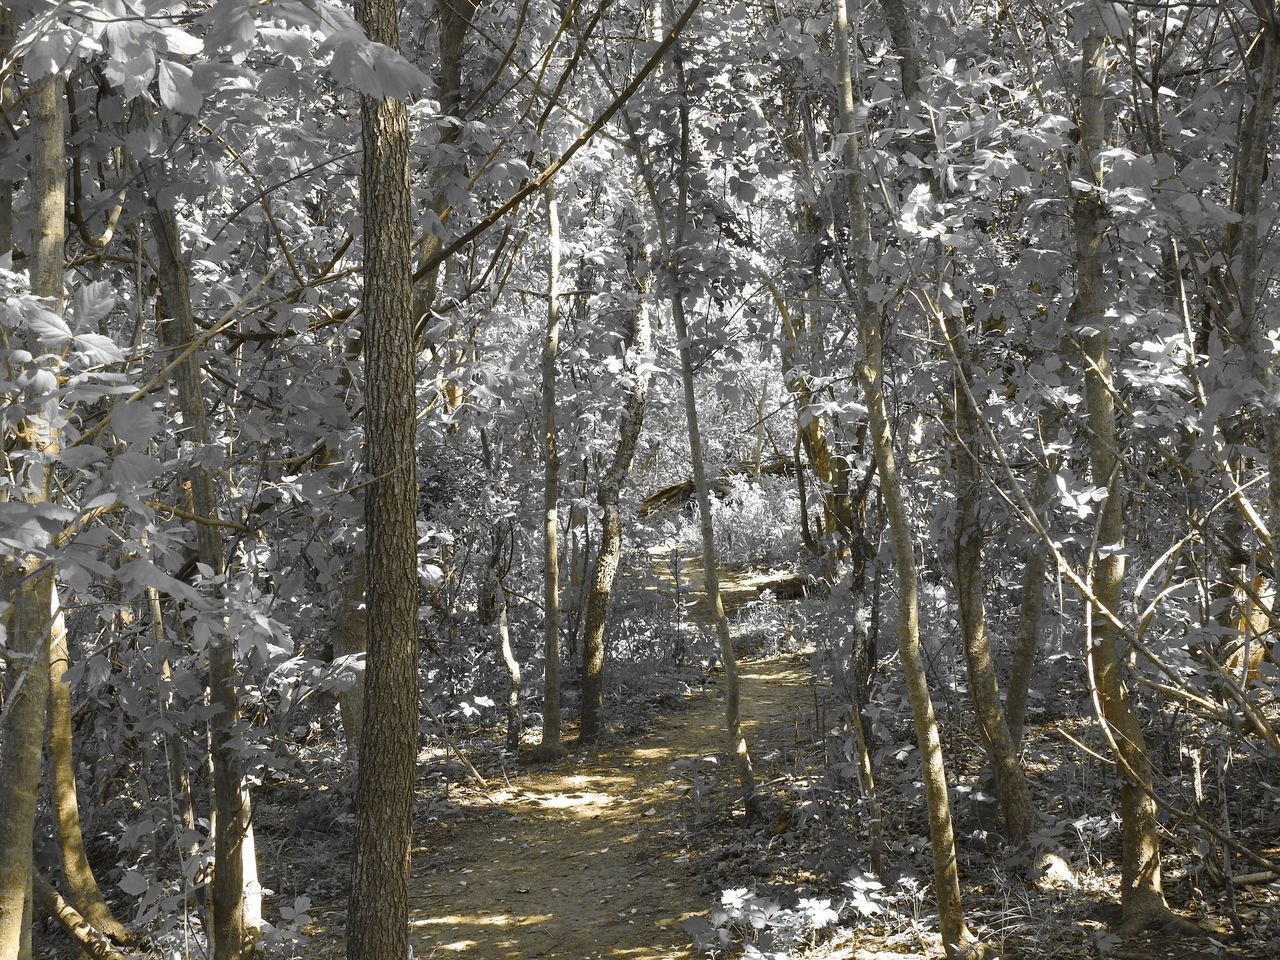 Crescent Bend Nature Park Nature Photography Selective Color Creekside Trail